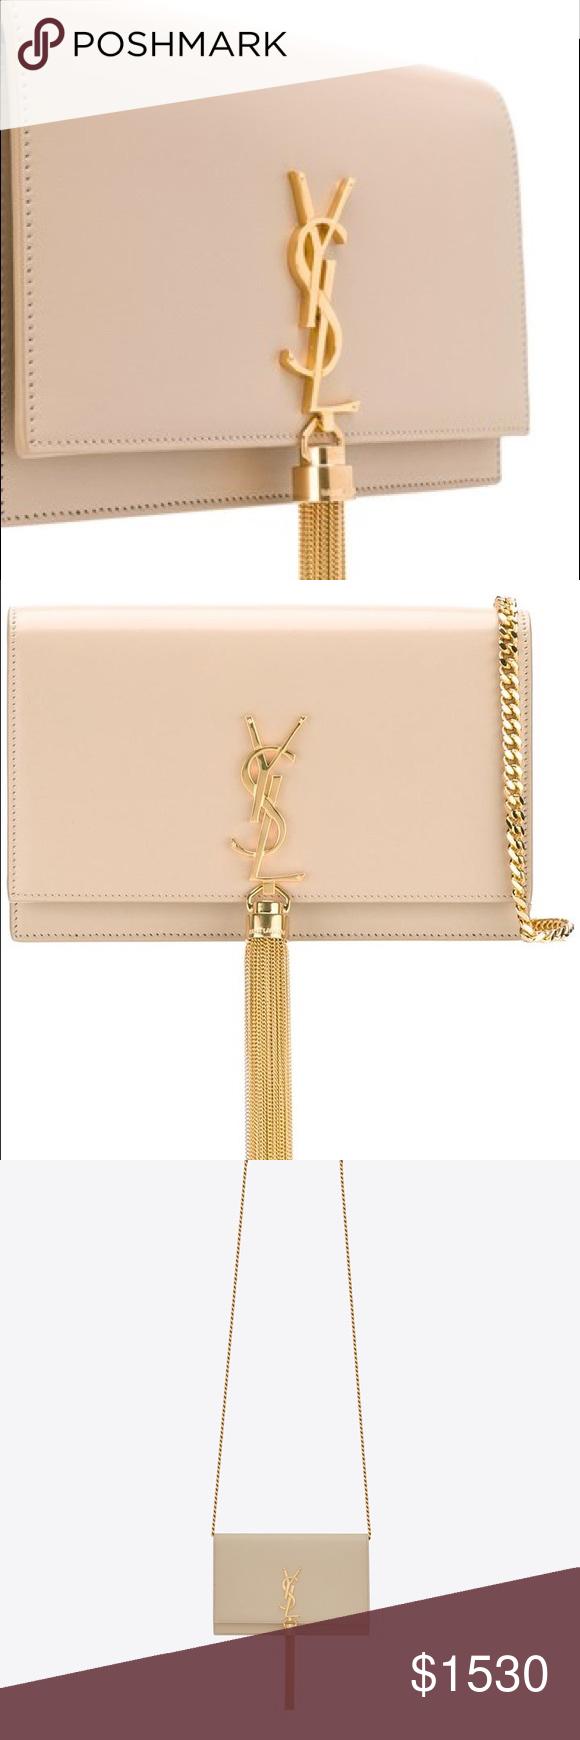 YSL Monogram Small Kate Tassel Cross Body Bag CLASSIC SAINT LAURENT CHAIN  WALLET IN POWDER WITH bf038b12fe506